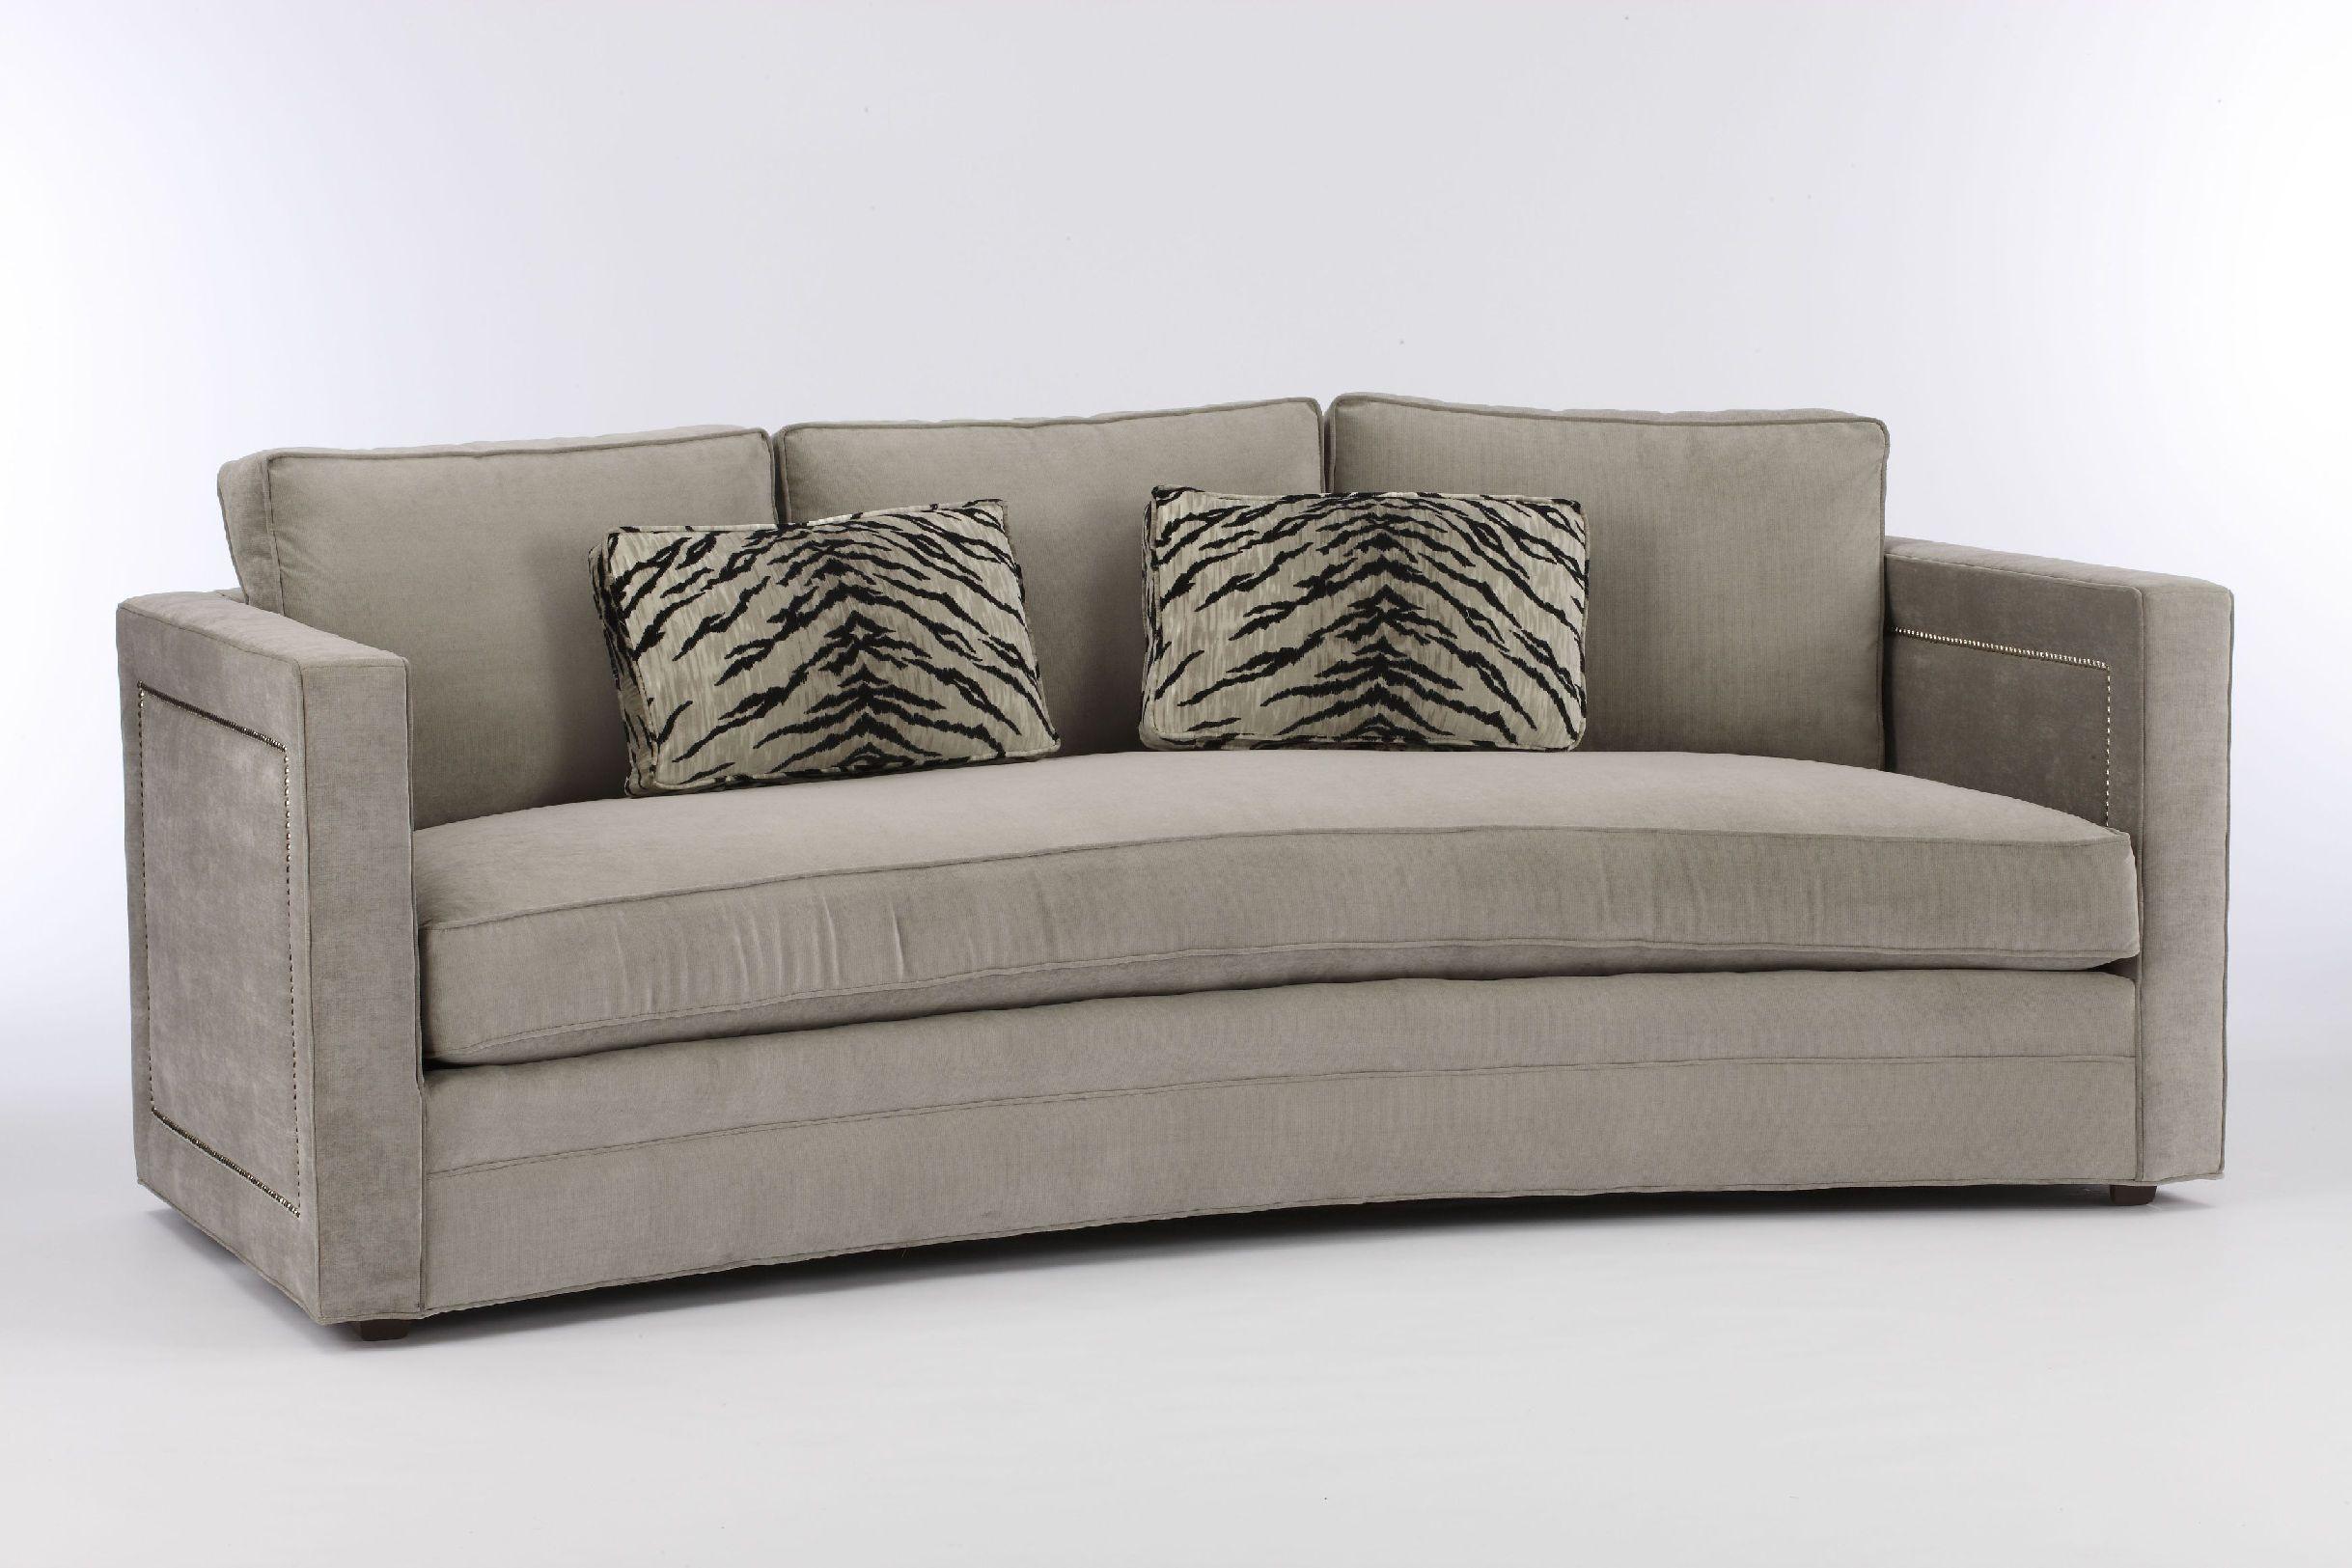 Southern Furniture Living Room Simon Sofa 1700 Matter Brothers